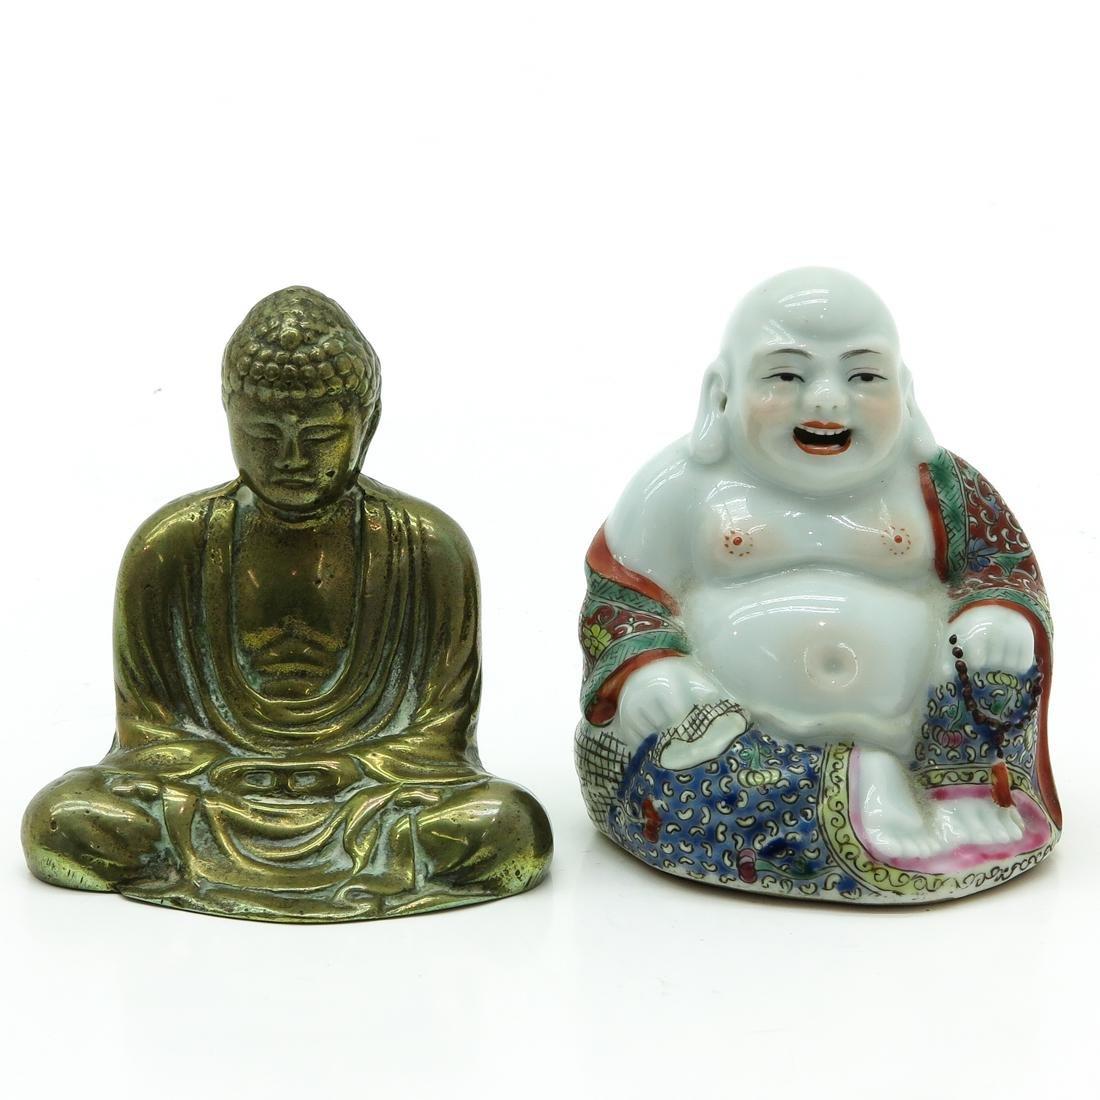 Lot of 2 Buddha Sculptures